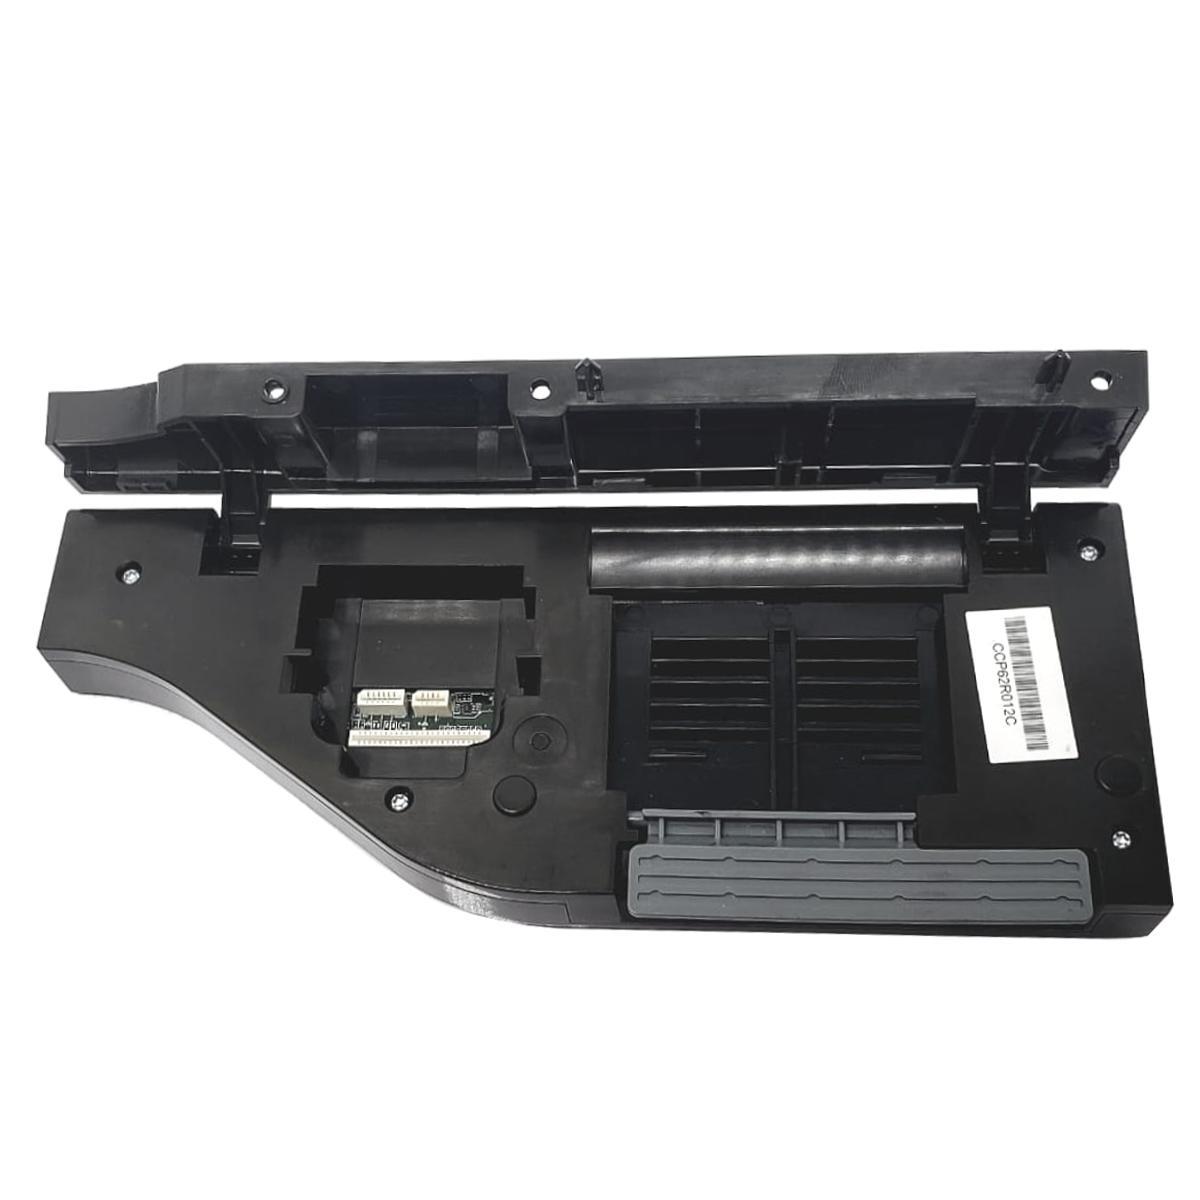 Painel / Visor Digital da Multifuncional HP PRO 7612 A3 - G1X85A